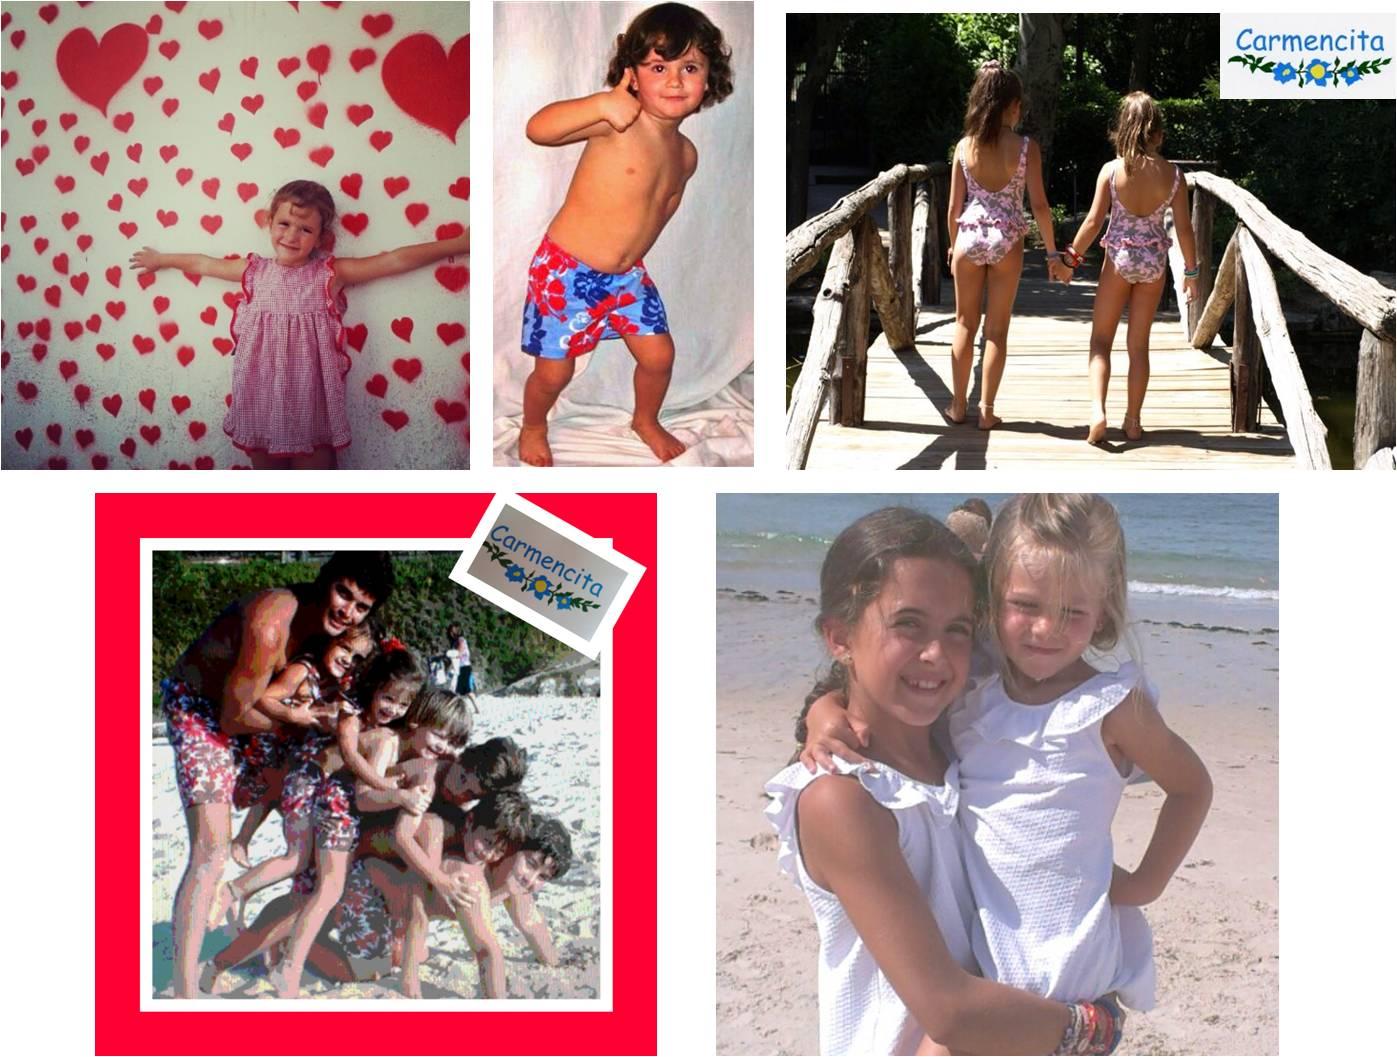 Baño Infantil Carmencita:Desde Carmencita Infantil os deseamos un Feliz San Valentín